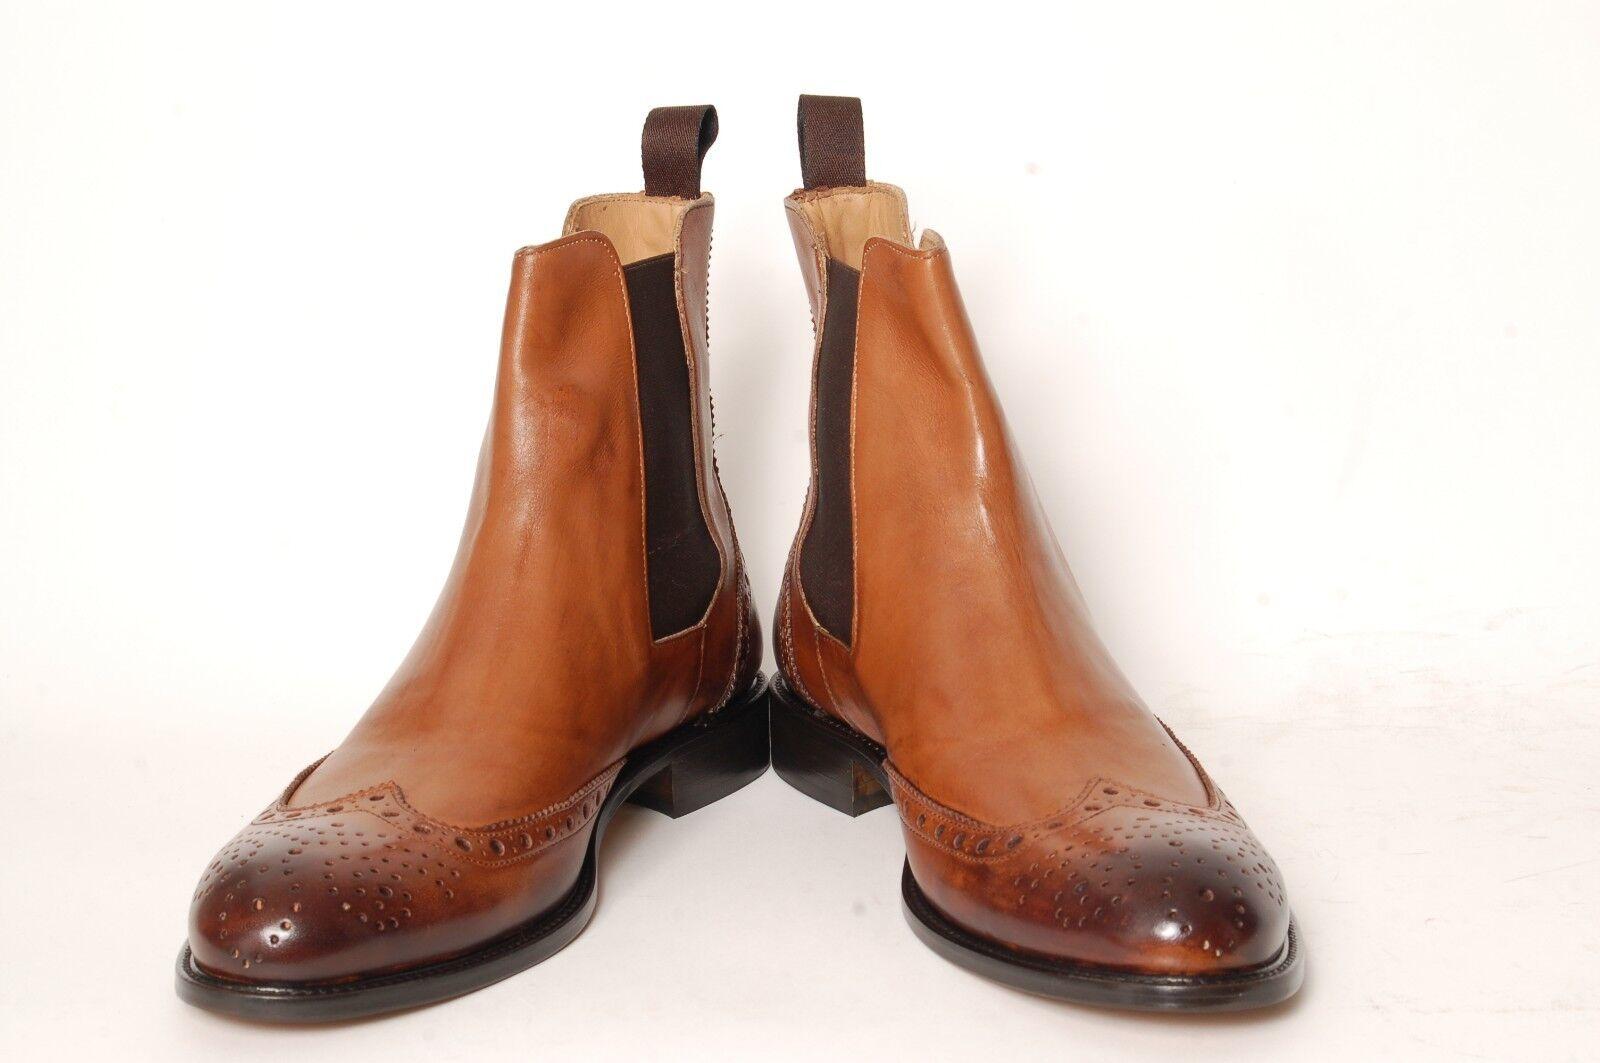 Scarpe-ANTICA | CALZOLERIA CAMPANA-metà Stivaletti ALTA-Chelsea-boots | Scarpe-ANTICA 805 88b760